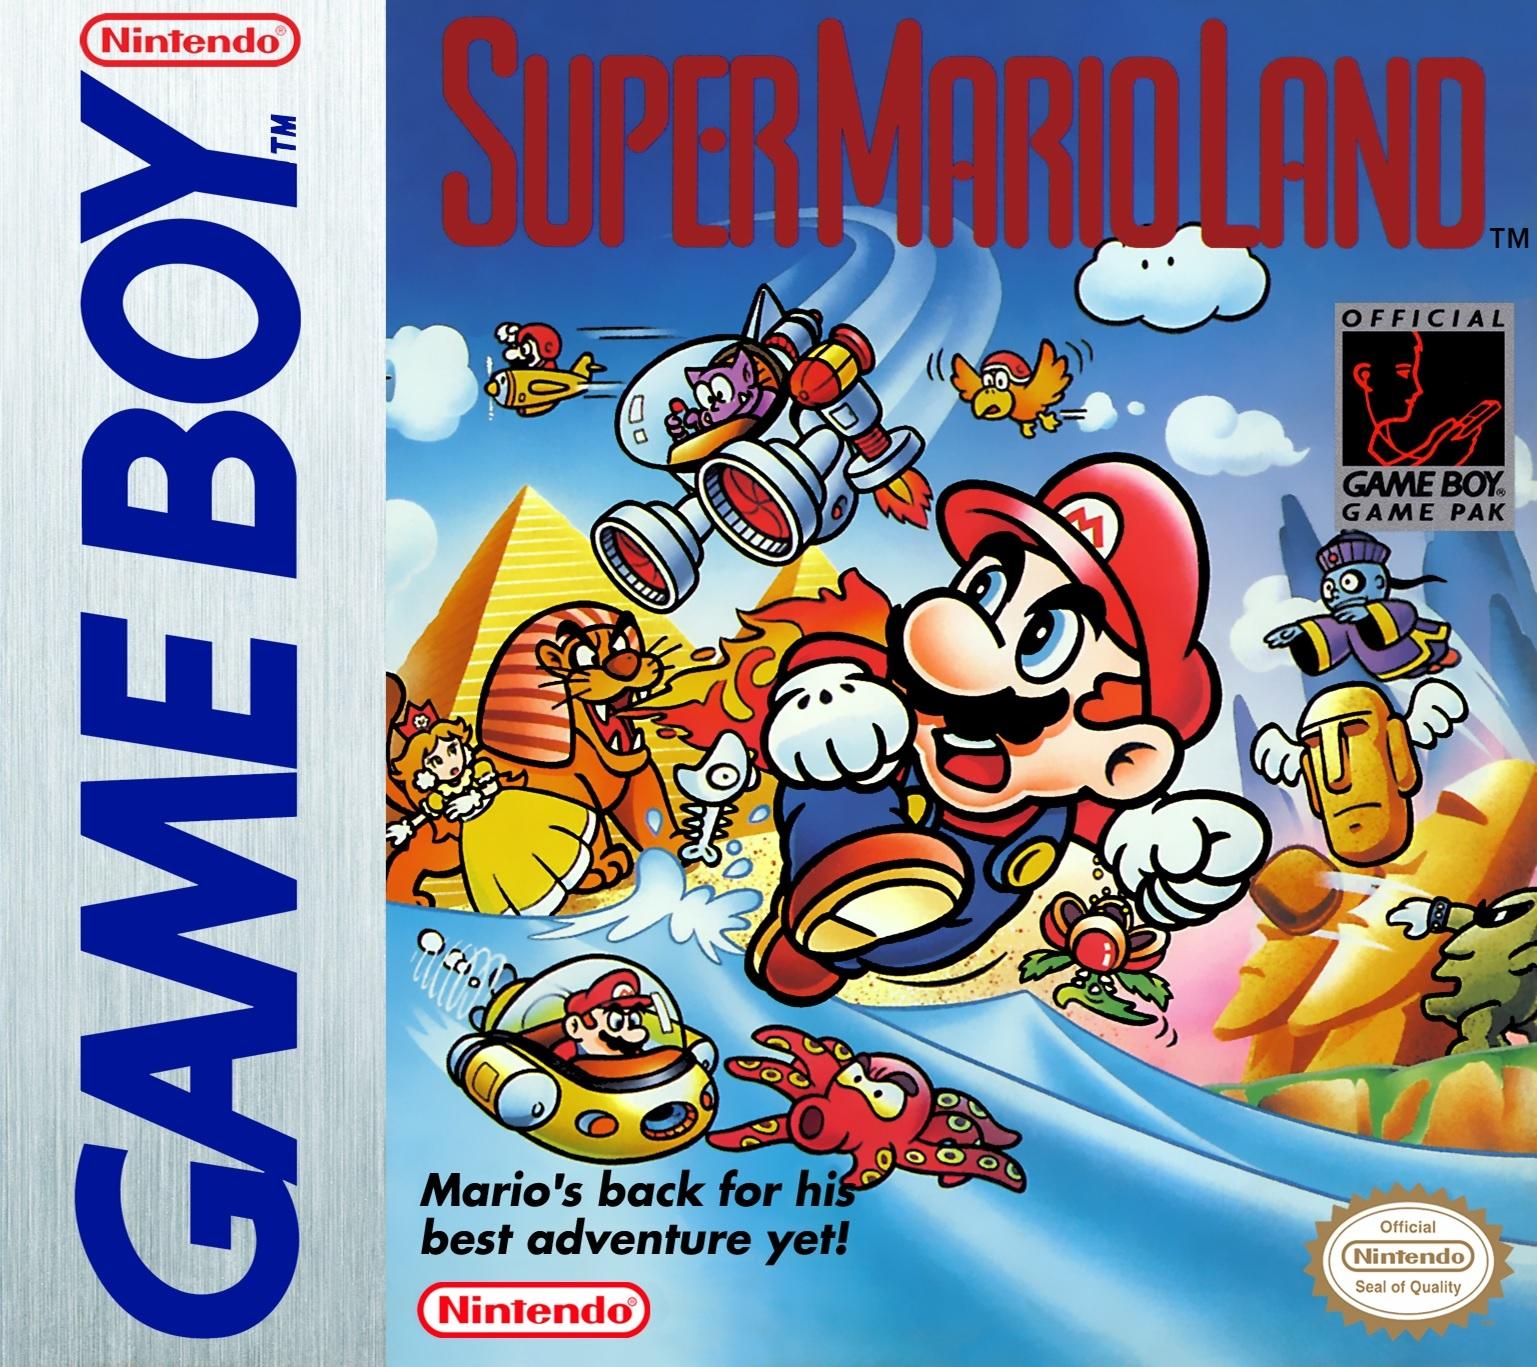 Dr. Mario e Call of Duty: Ghosts (Big Boy Games) - YouTube